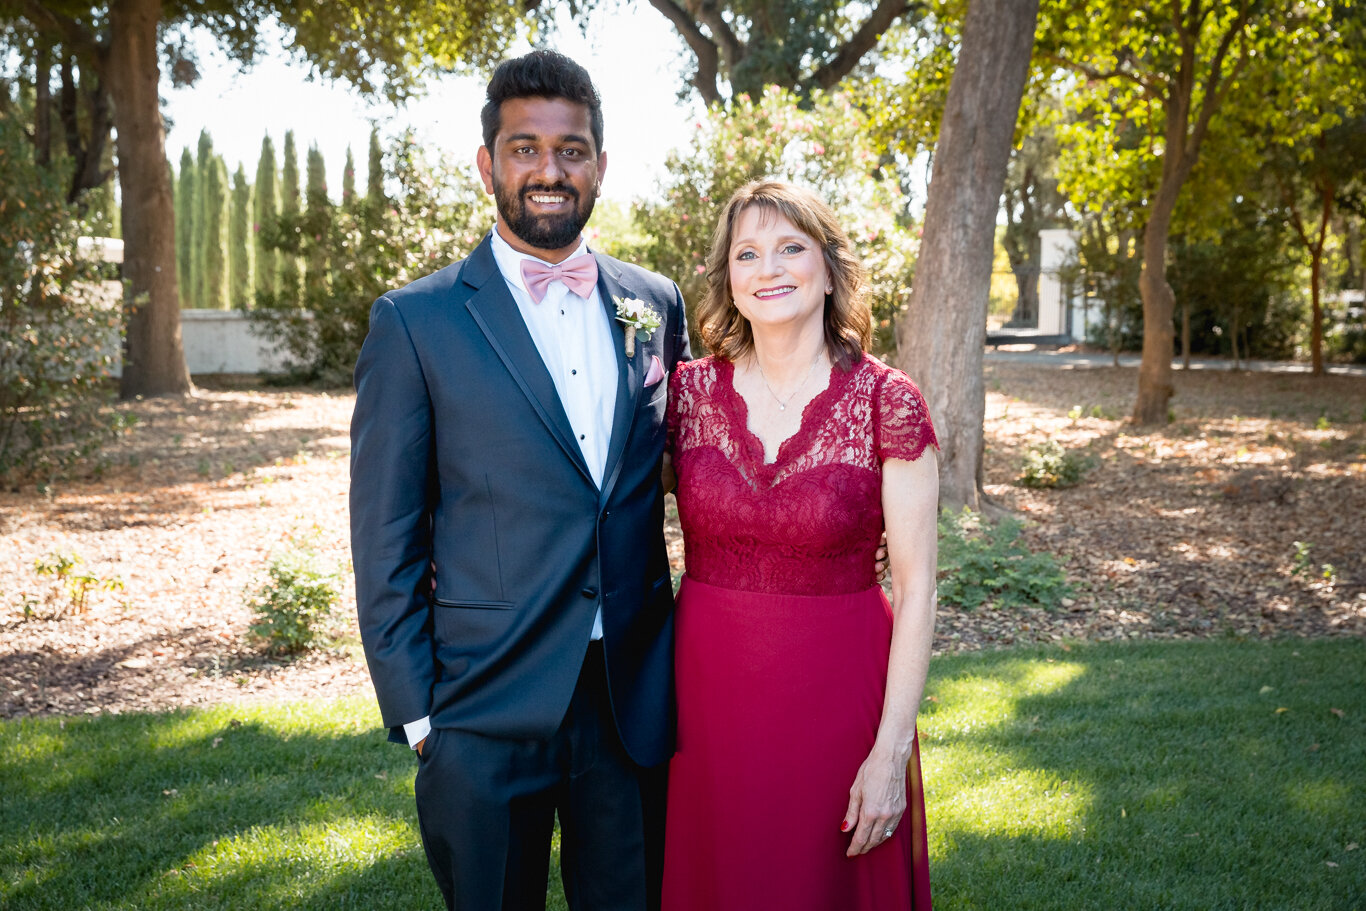 2019.08.24_Emily-Ashir-Wedding-at-the-Maples-5560.jpg